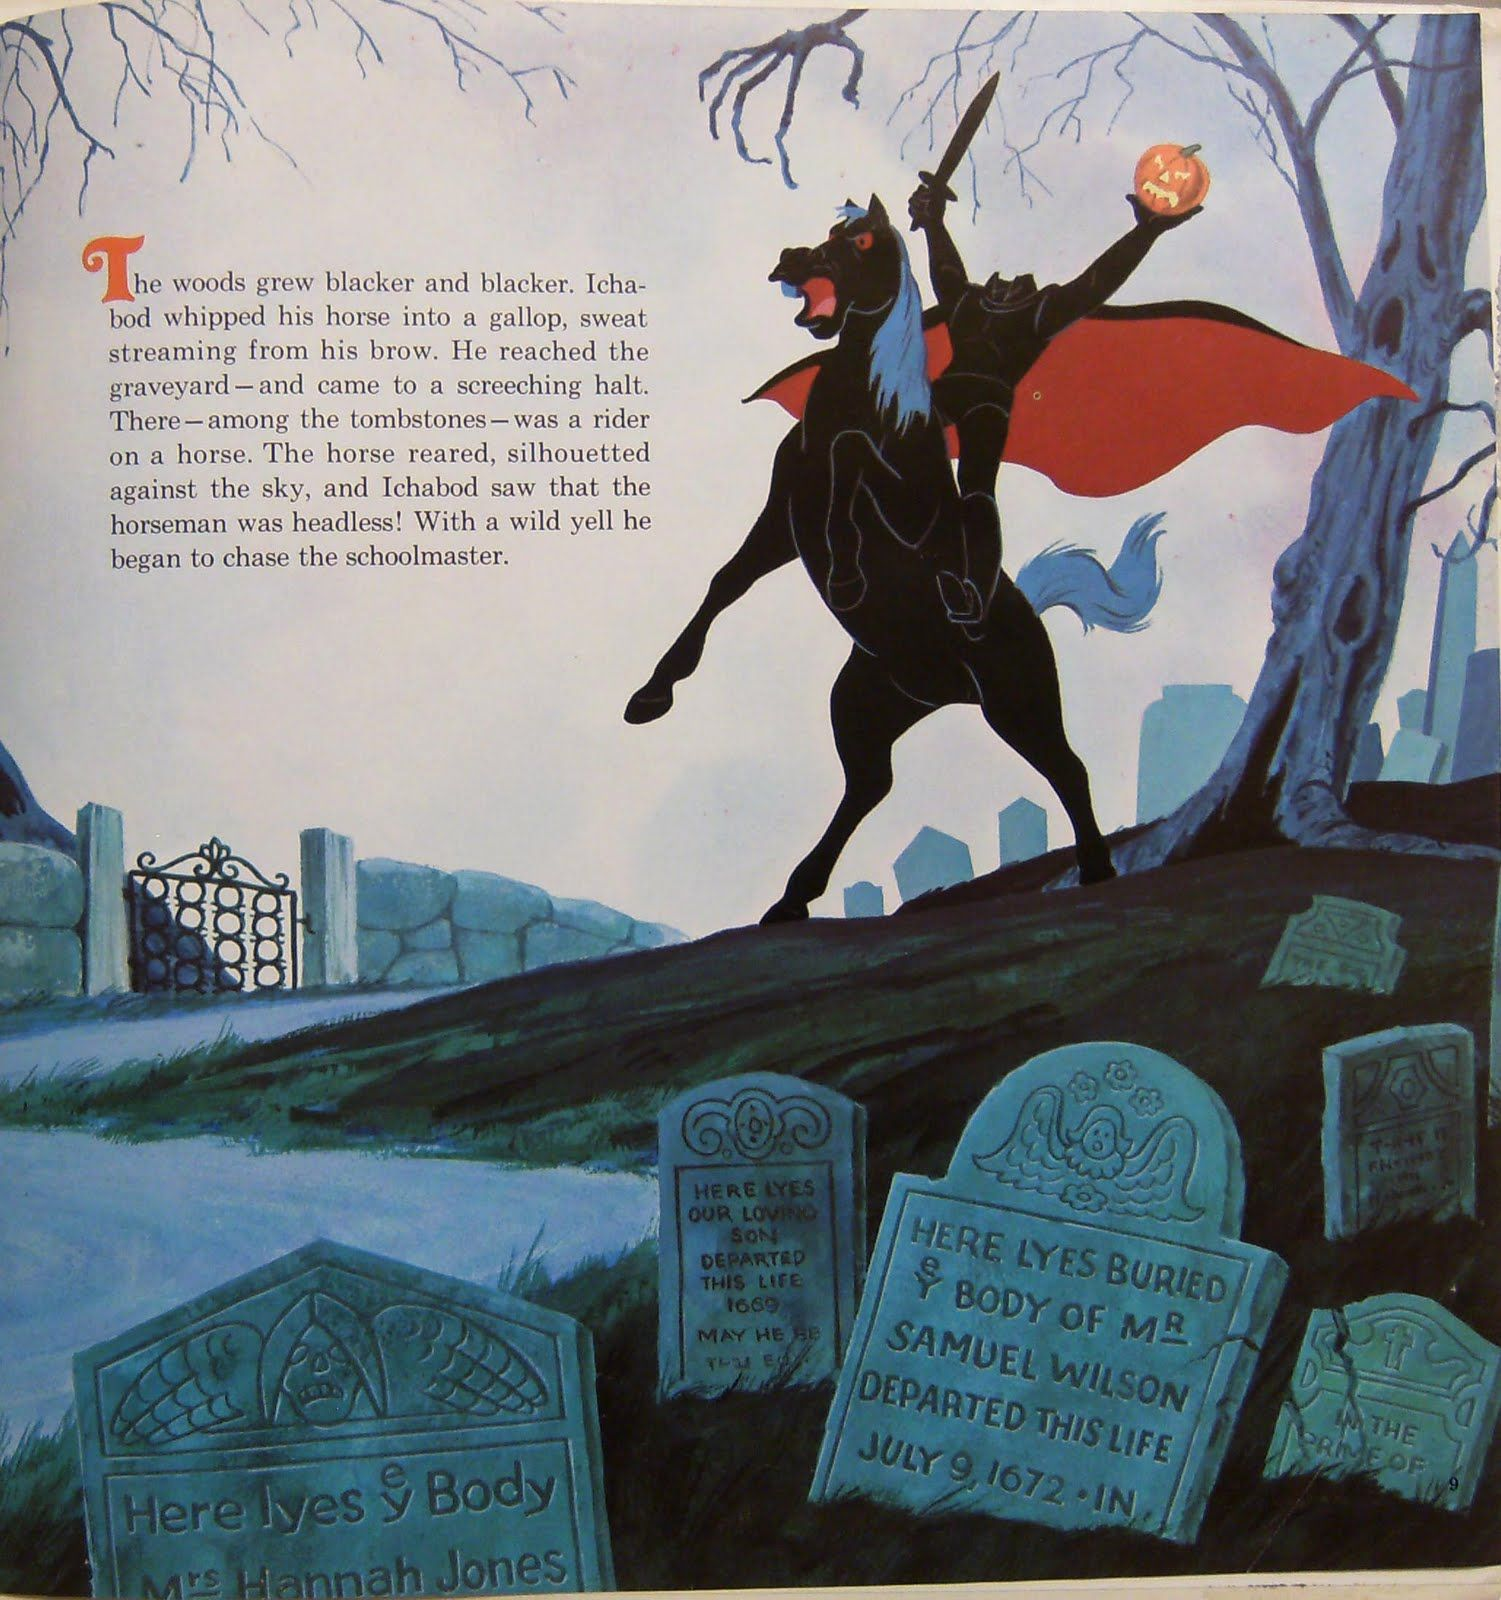 Sleepy Hollow Headless Horseman: The Legend Of Sleepy Hollow (Disneyland Record, 1971